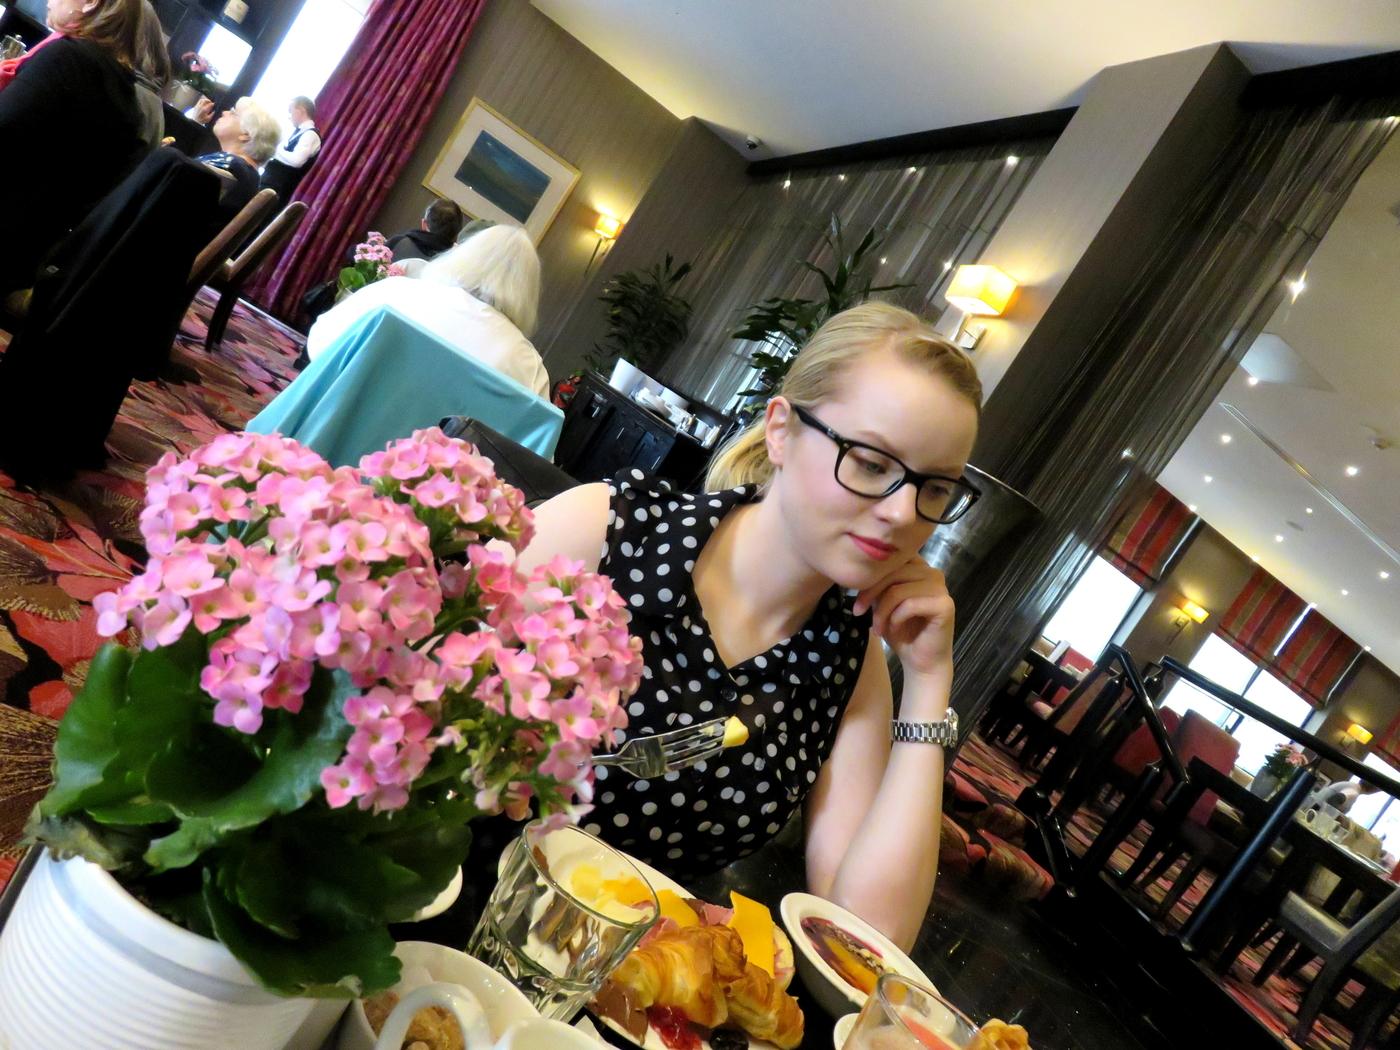 ashling hotel breakfast 2.JPG